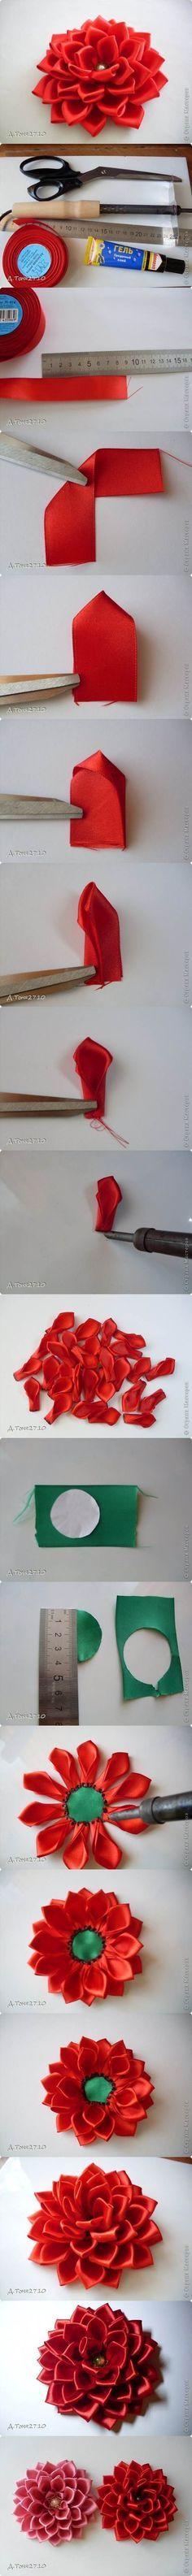 DIY Satin Ribbon Dahlia Petals | iCreativeIdeas.com LIKE Us on Facebook ==> www.facebook.com/...